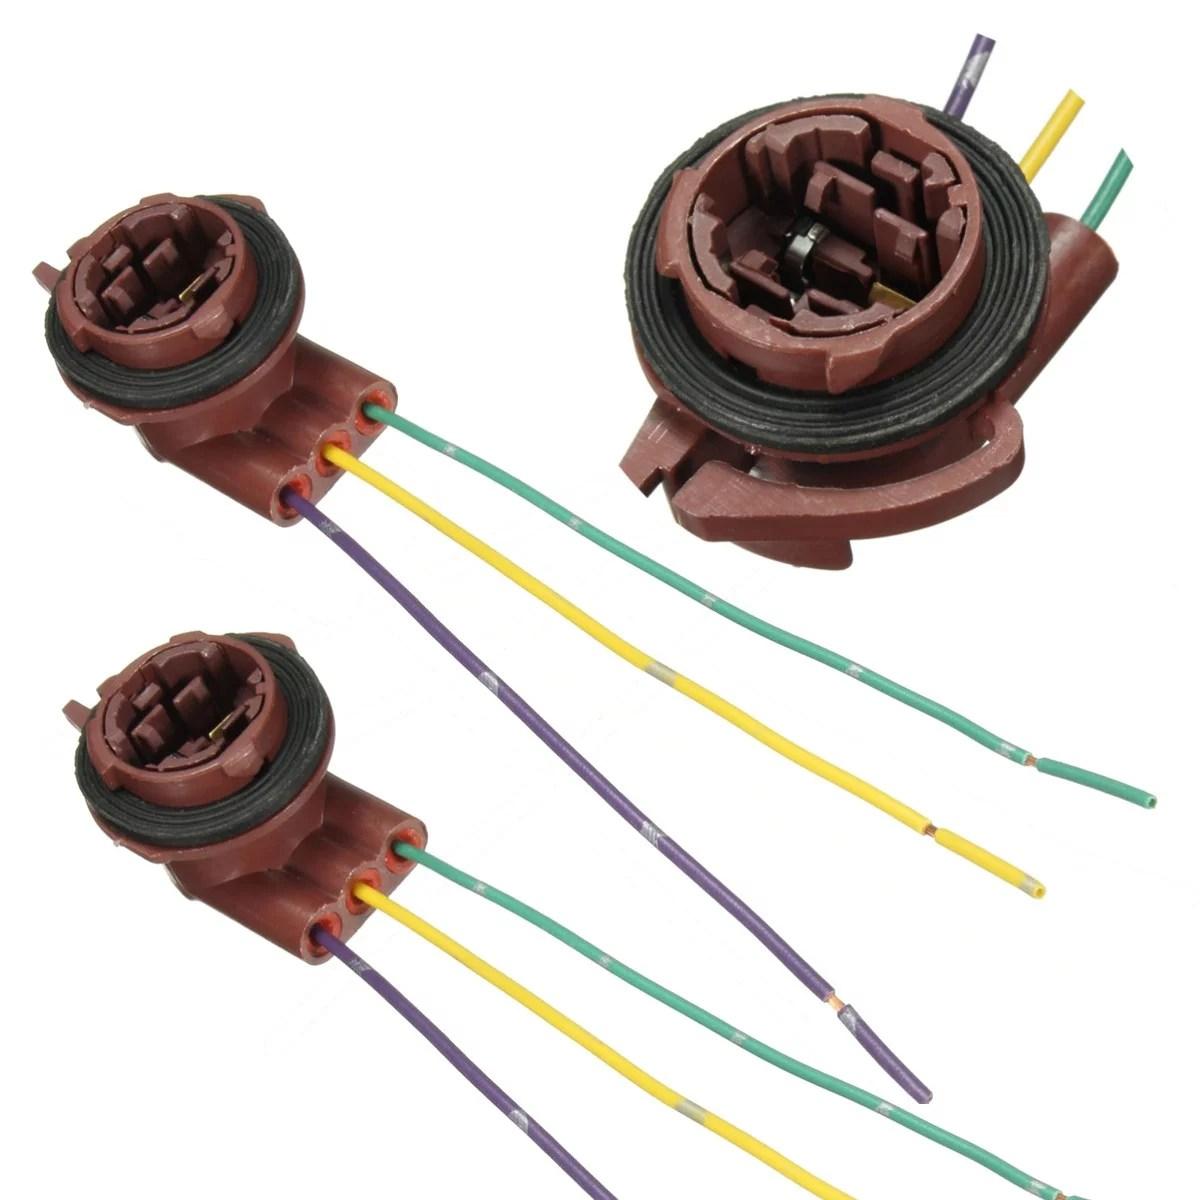 matcc 2pcs 12v brake turn signal indicator light socket wiring ford 4000 tractor wiring diagram 12v plug wiring harness adapter [ 1200 x 1200 Pixel ]